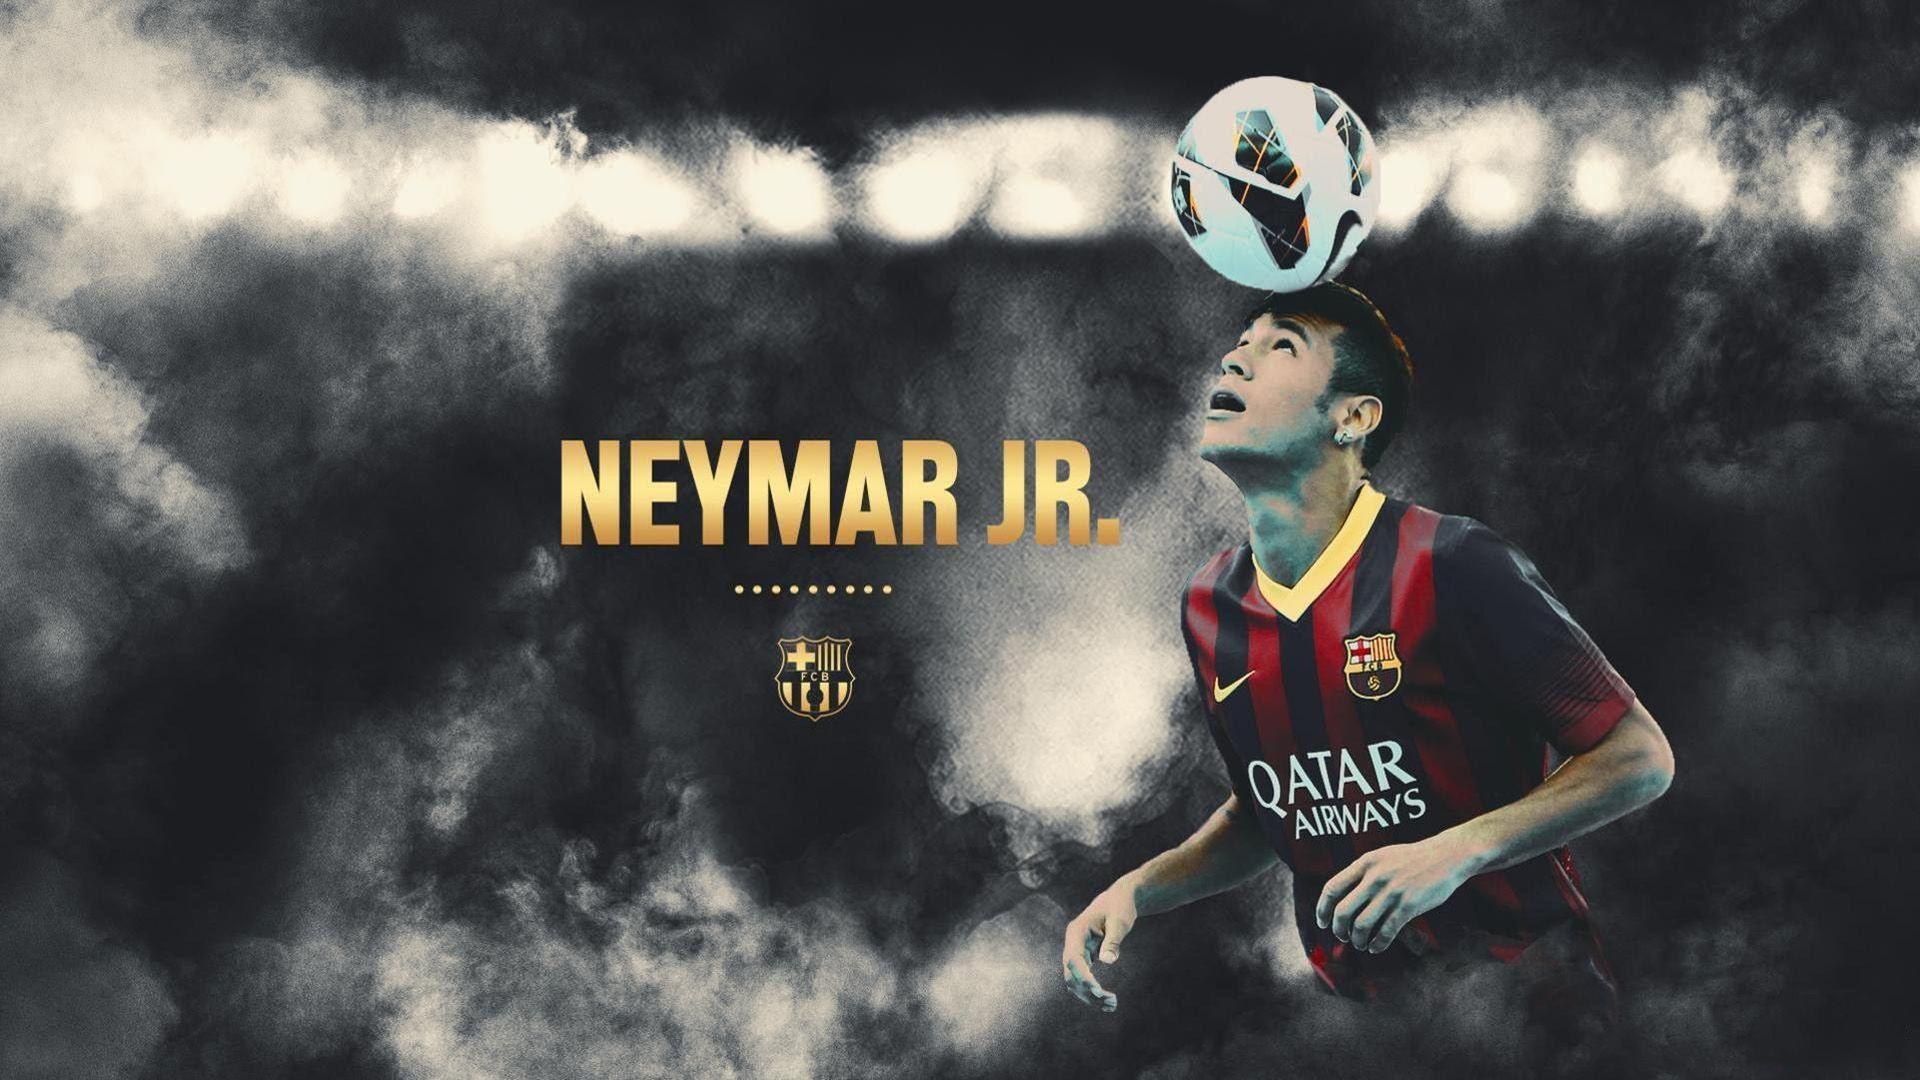 Neymar Wallpapers 2017 Hd Wallpaper Cave